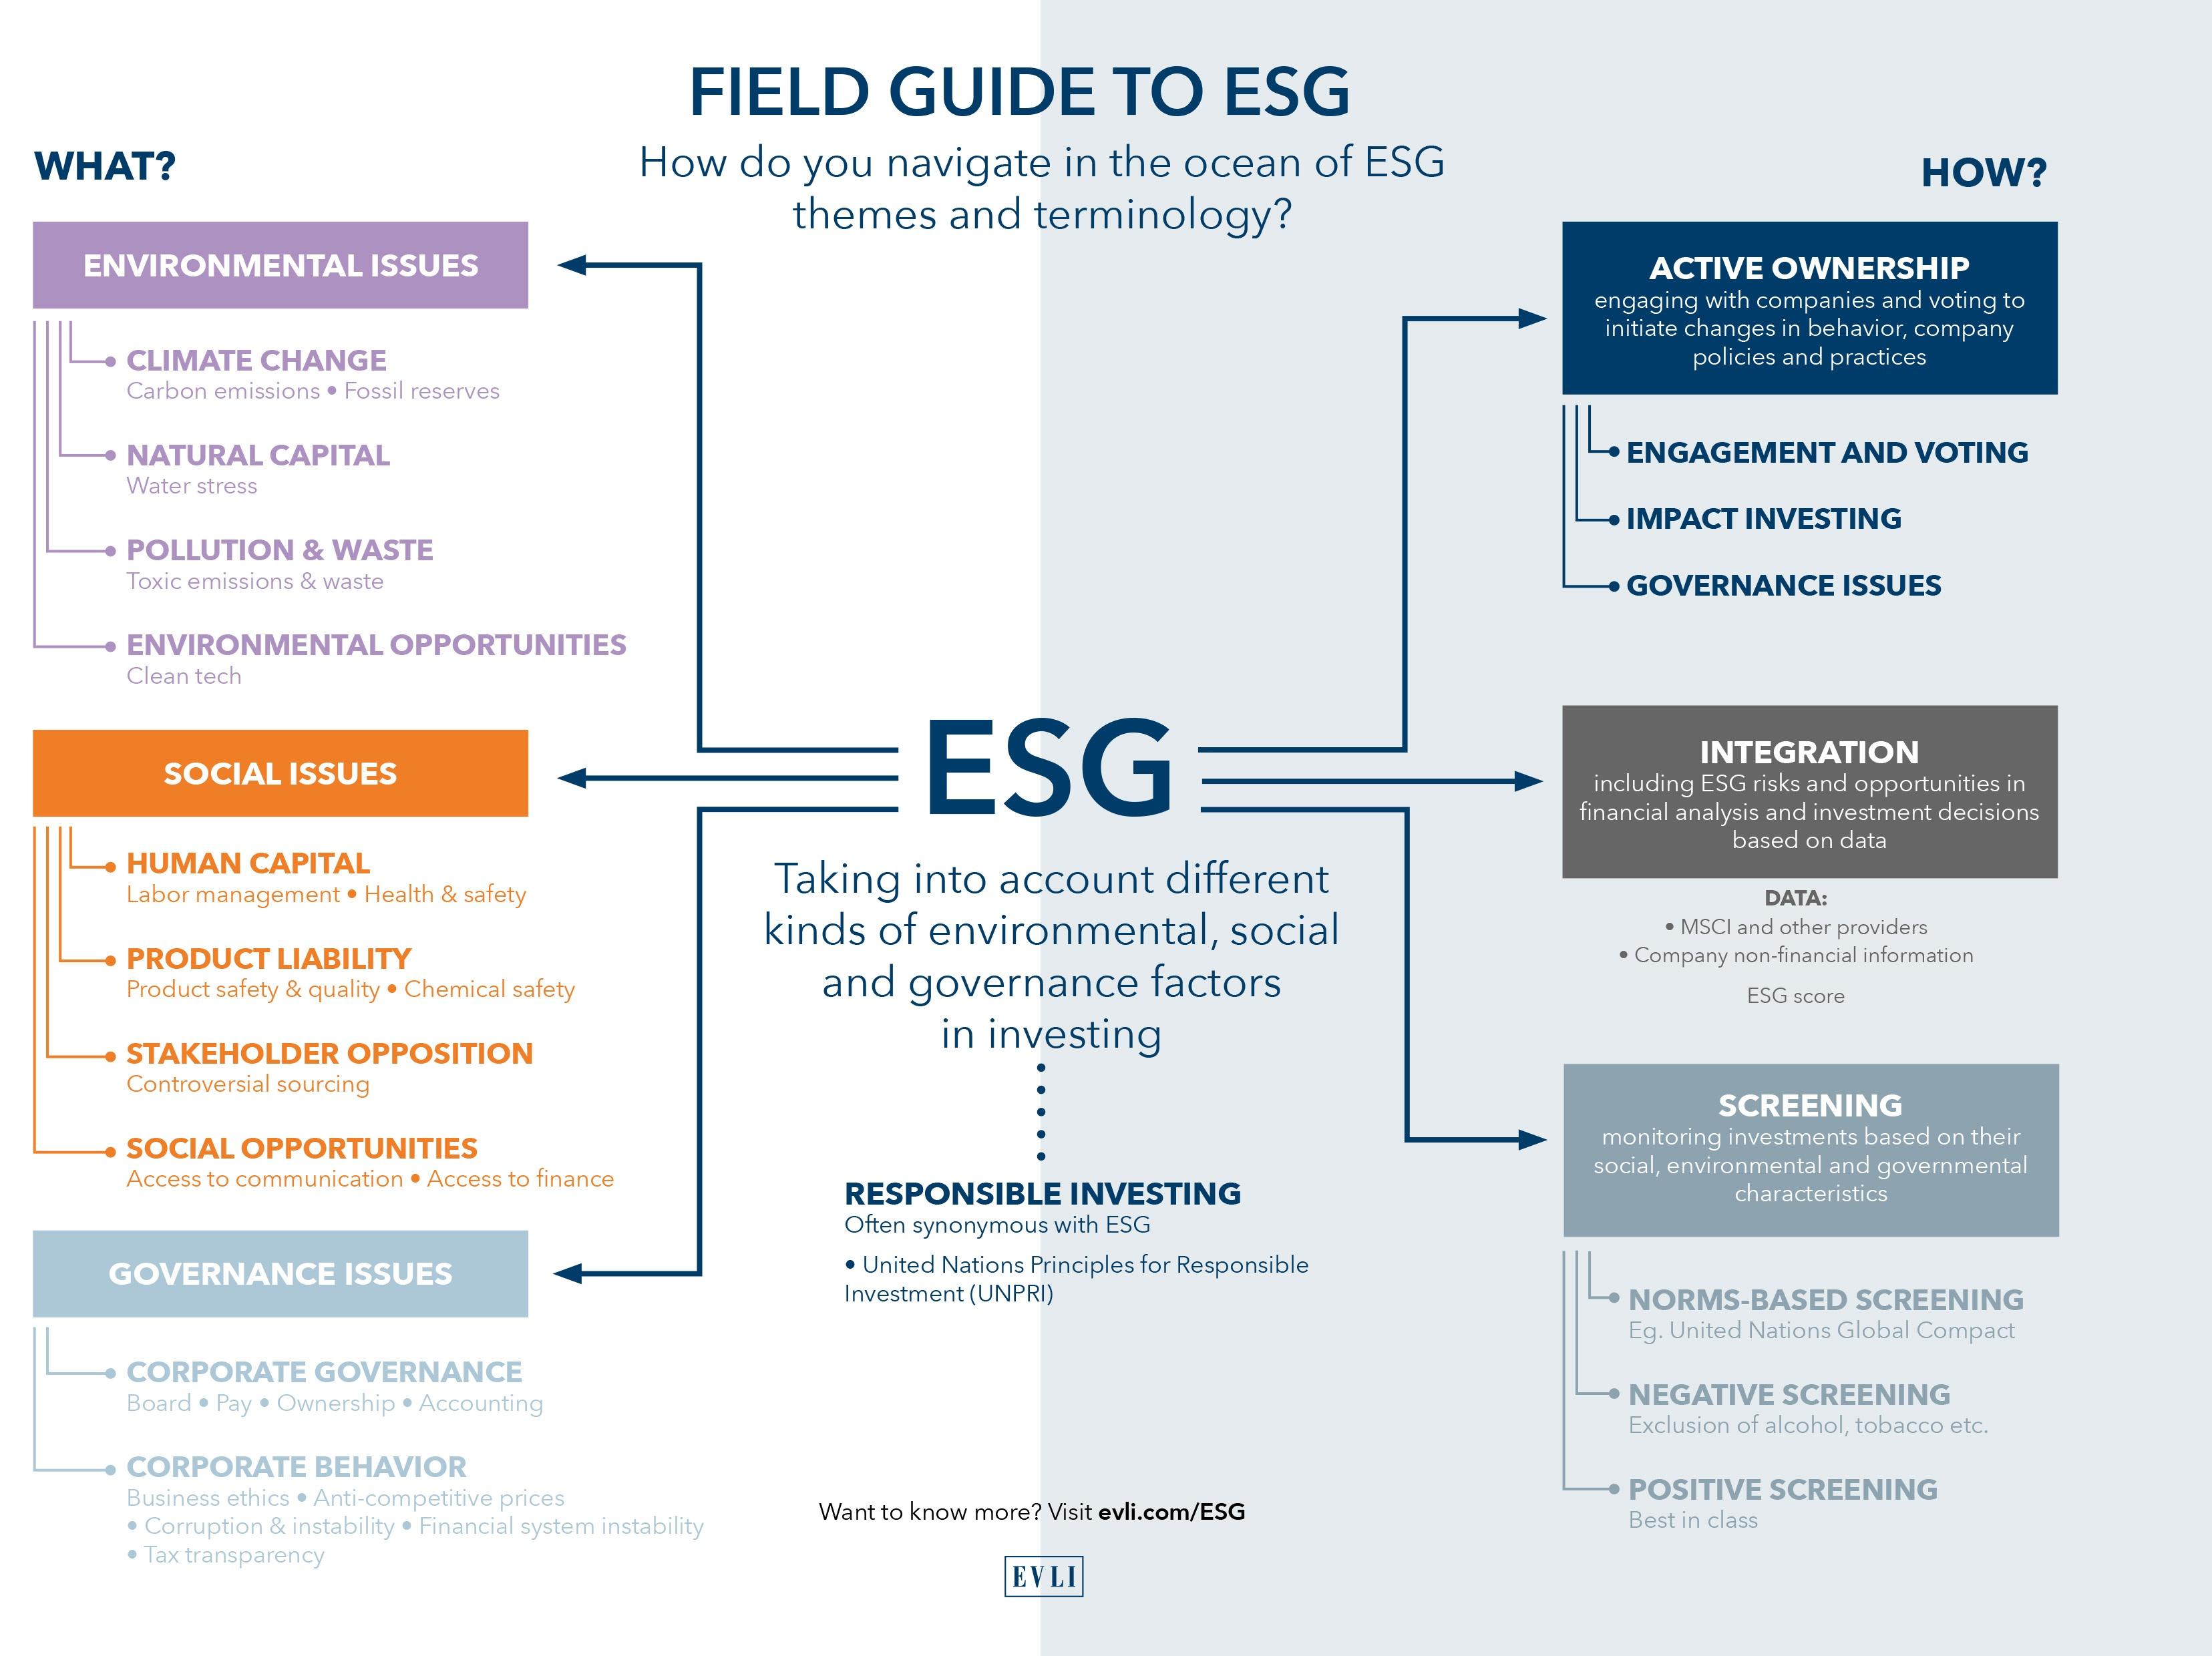 evli esg field guide